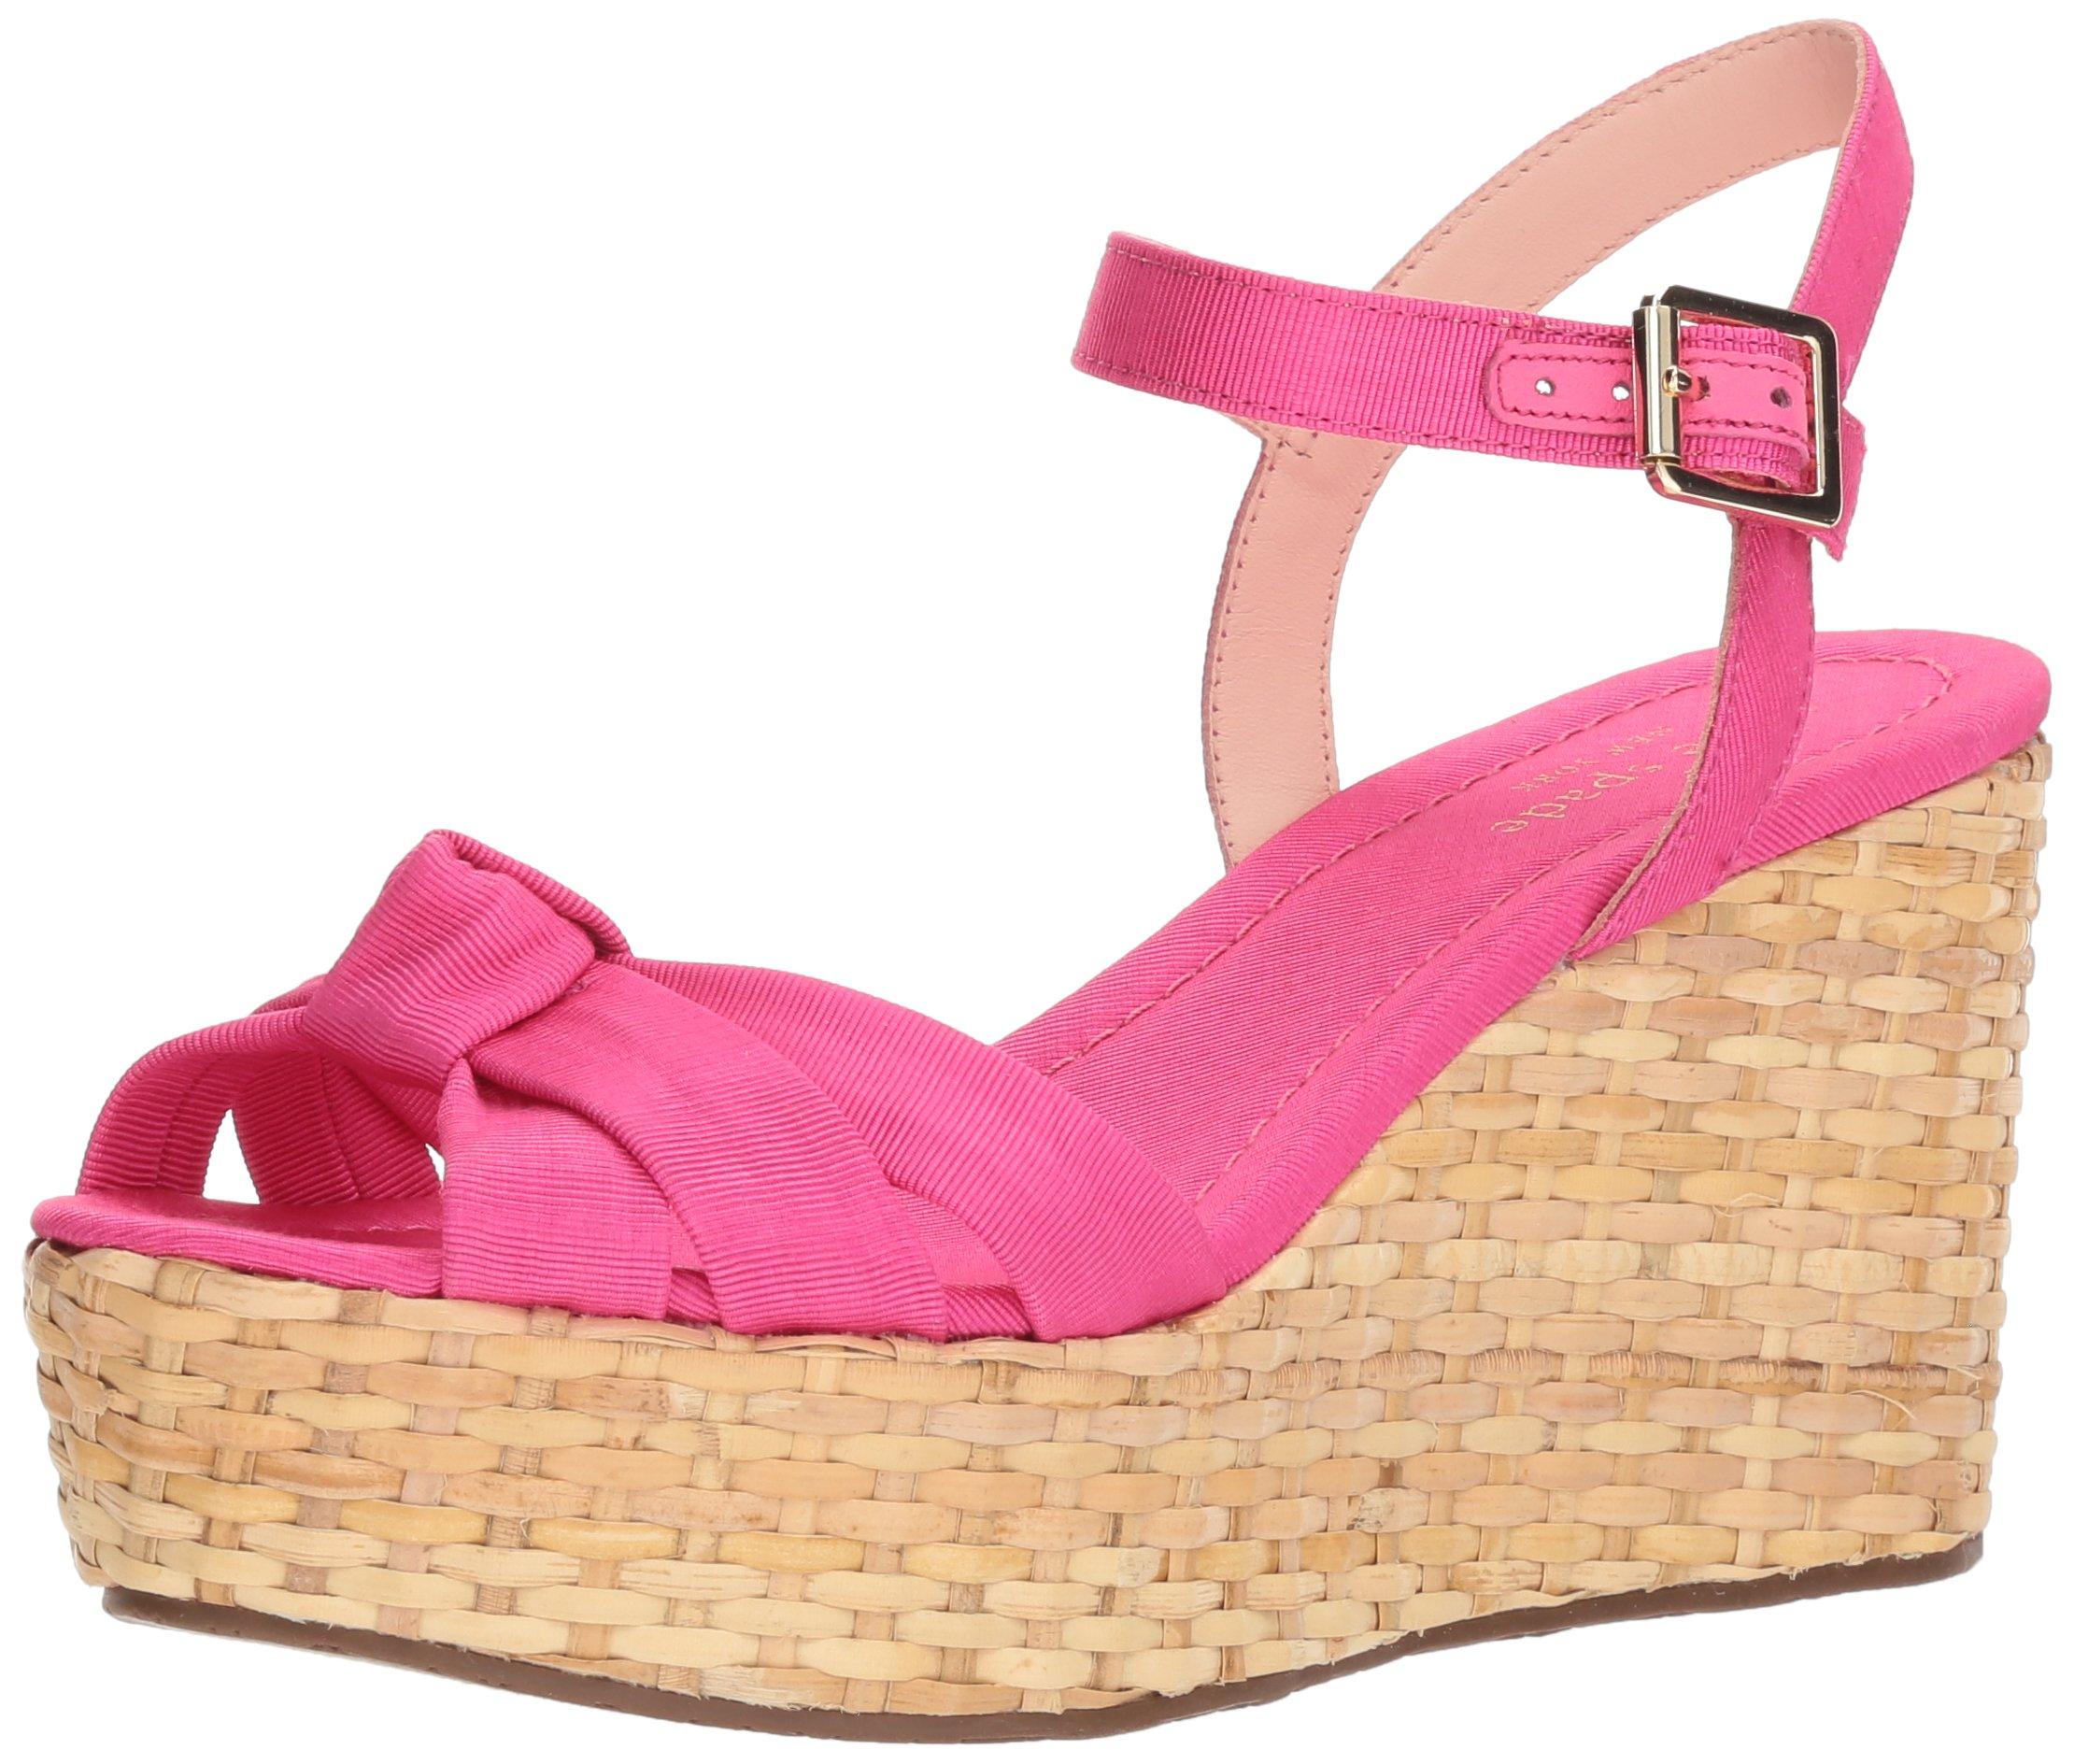 Kate Spade New York Women's Tilly Wedge Sandal, Pink Grosgrain, 8 Medium US